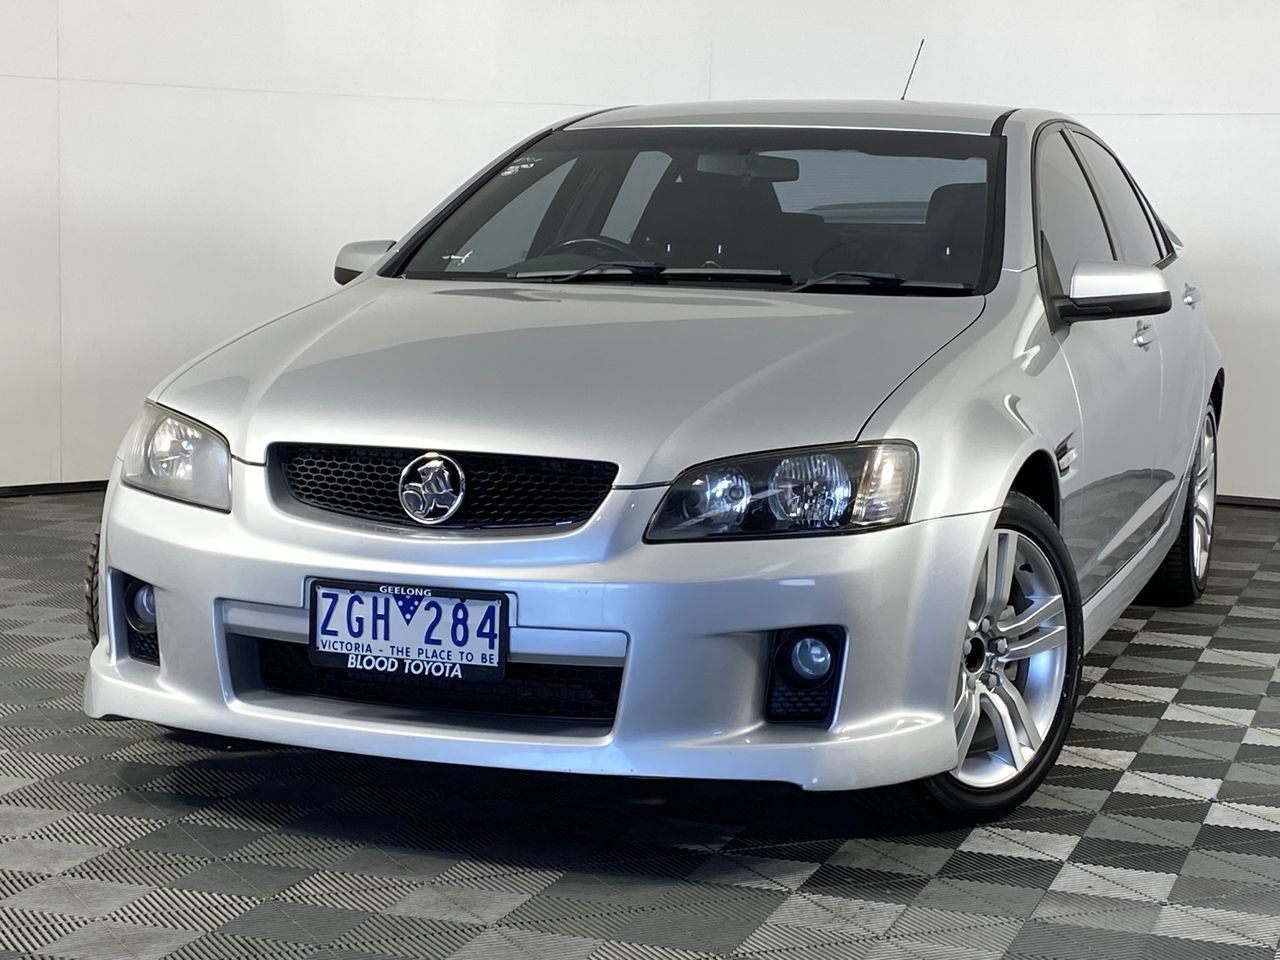 2010 Holden Commodore SV6 VE Automatic Sedan